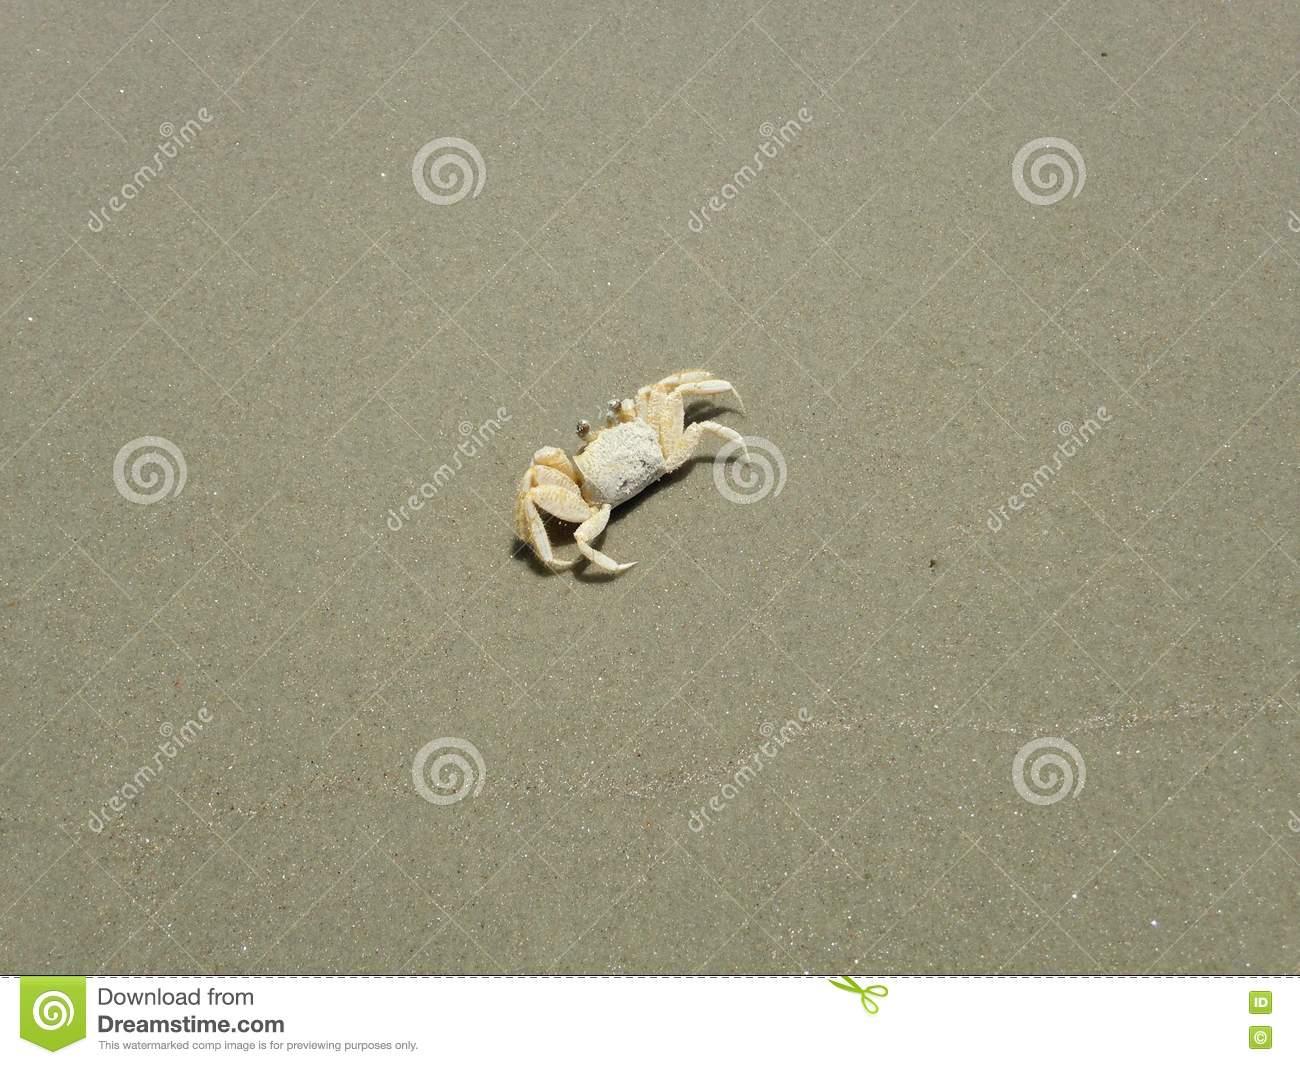 Ocypode Quadrata (Atlantic Ghost Crab) On Sand. Stock Photo.